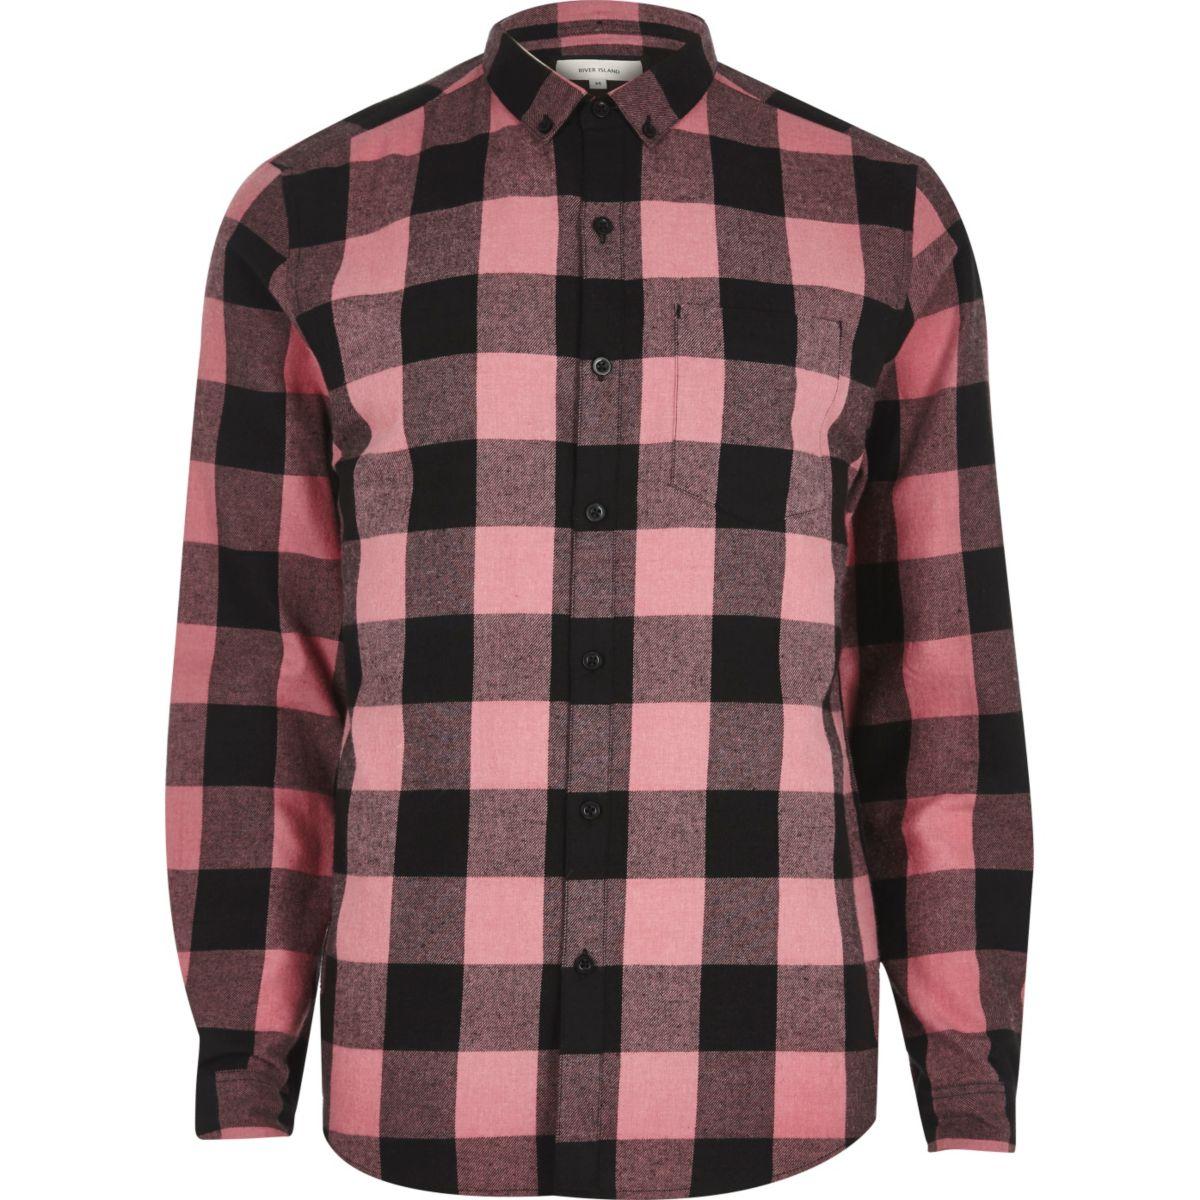 Pink buffalo check casual shirt